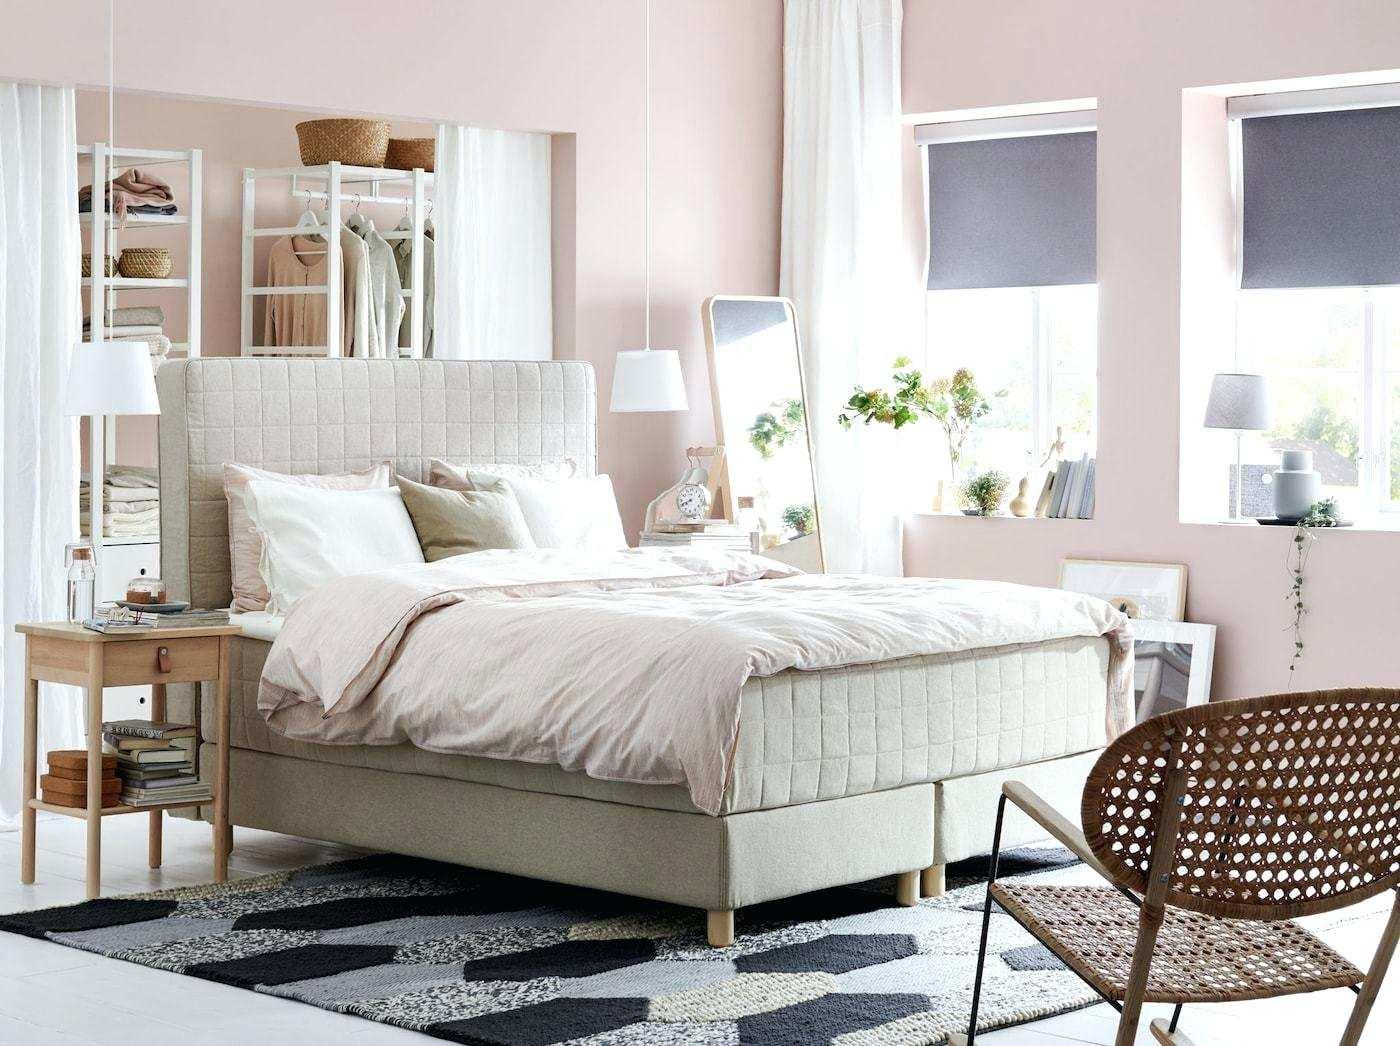 Full Size of Boxspringbett Ikea Schlafzimmer Ideen Elegant Sofa Mit Schlaffunktion Modulküche Betten Bei Set Miniküche Küche Kosten 160x200 Kaufen Wohnzimmer Boxspringbett Ikea